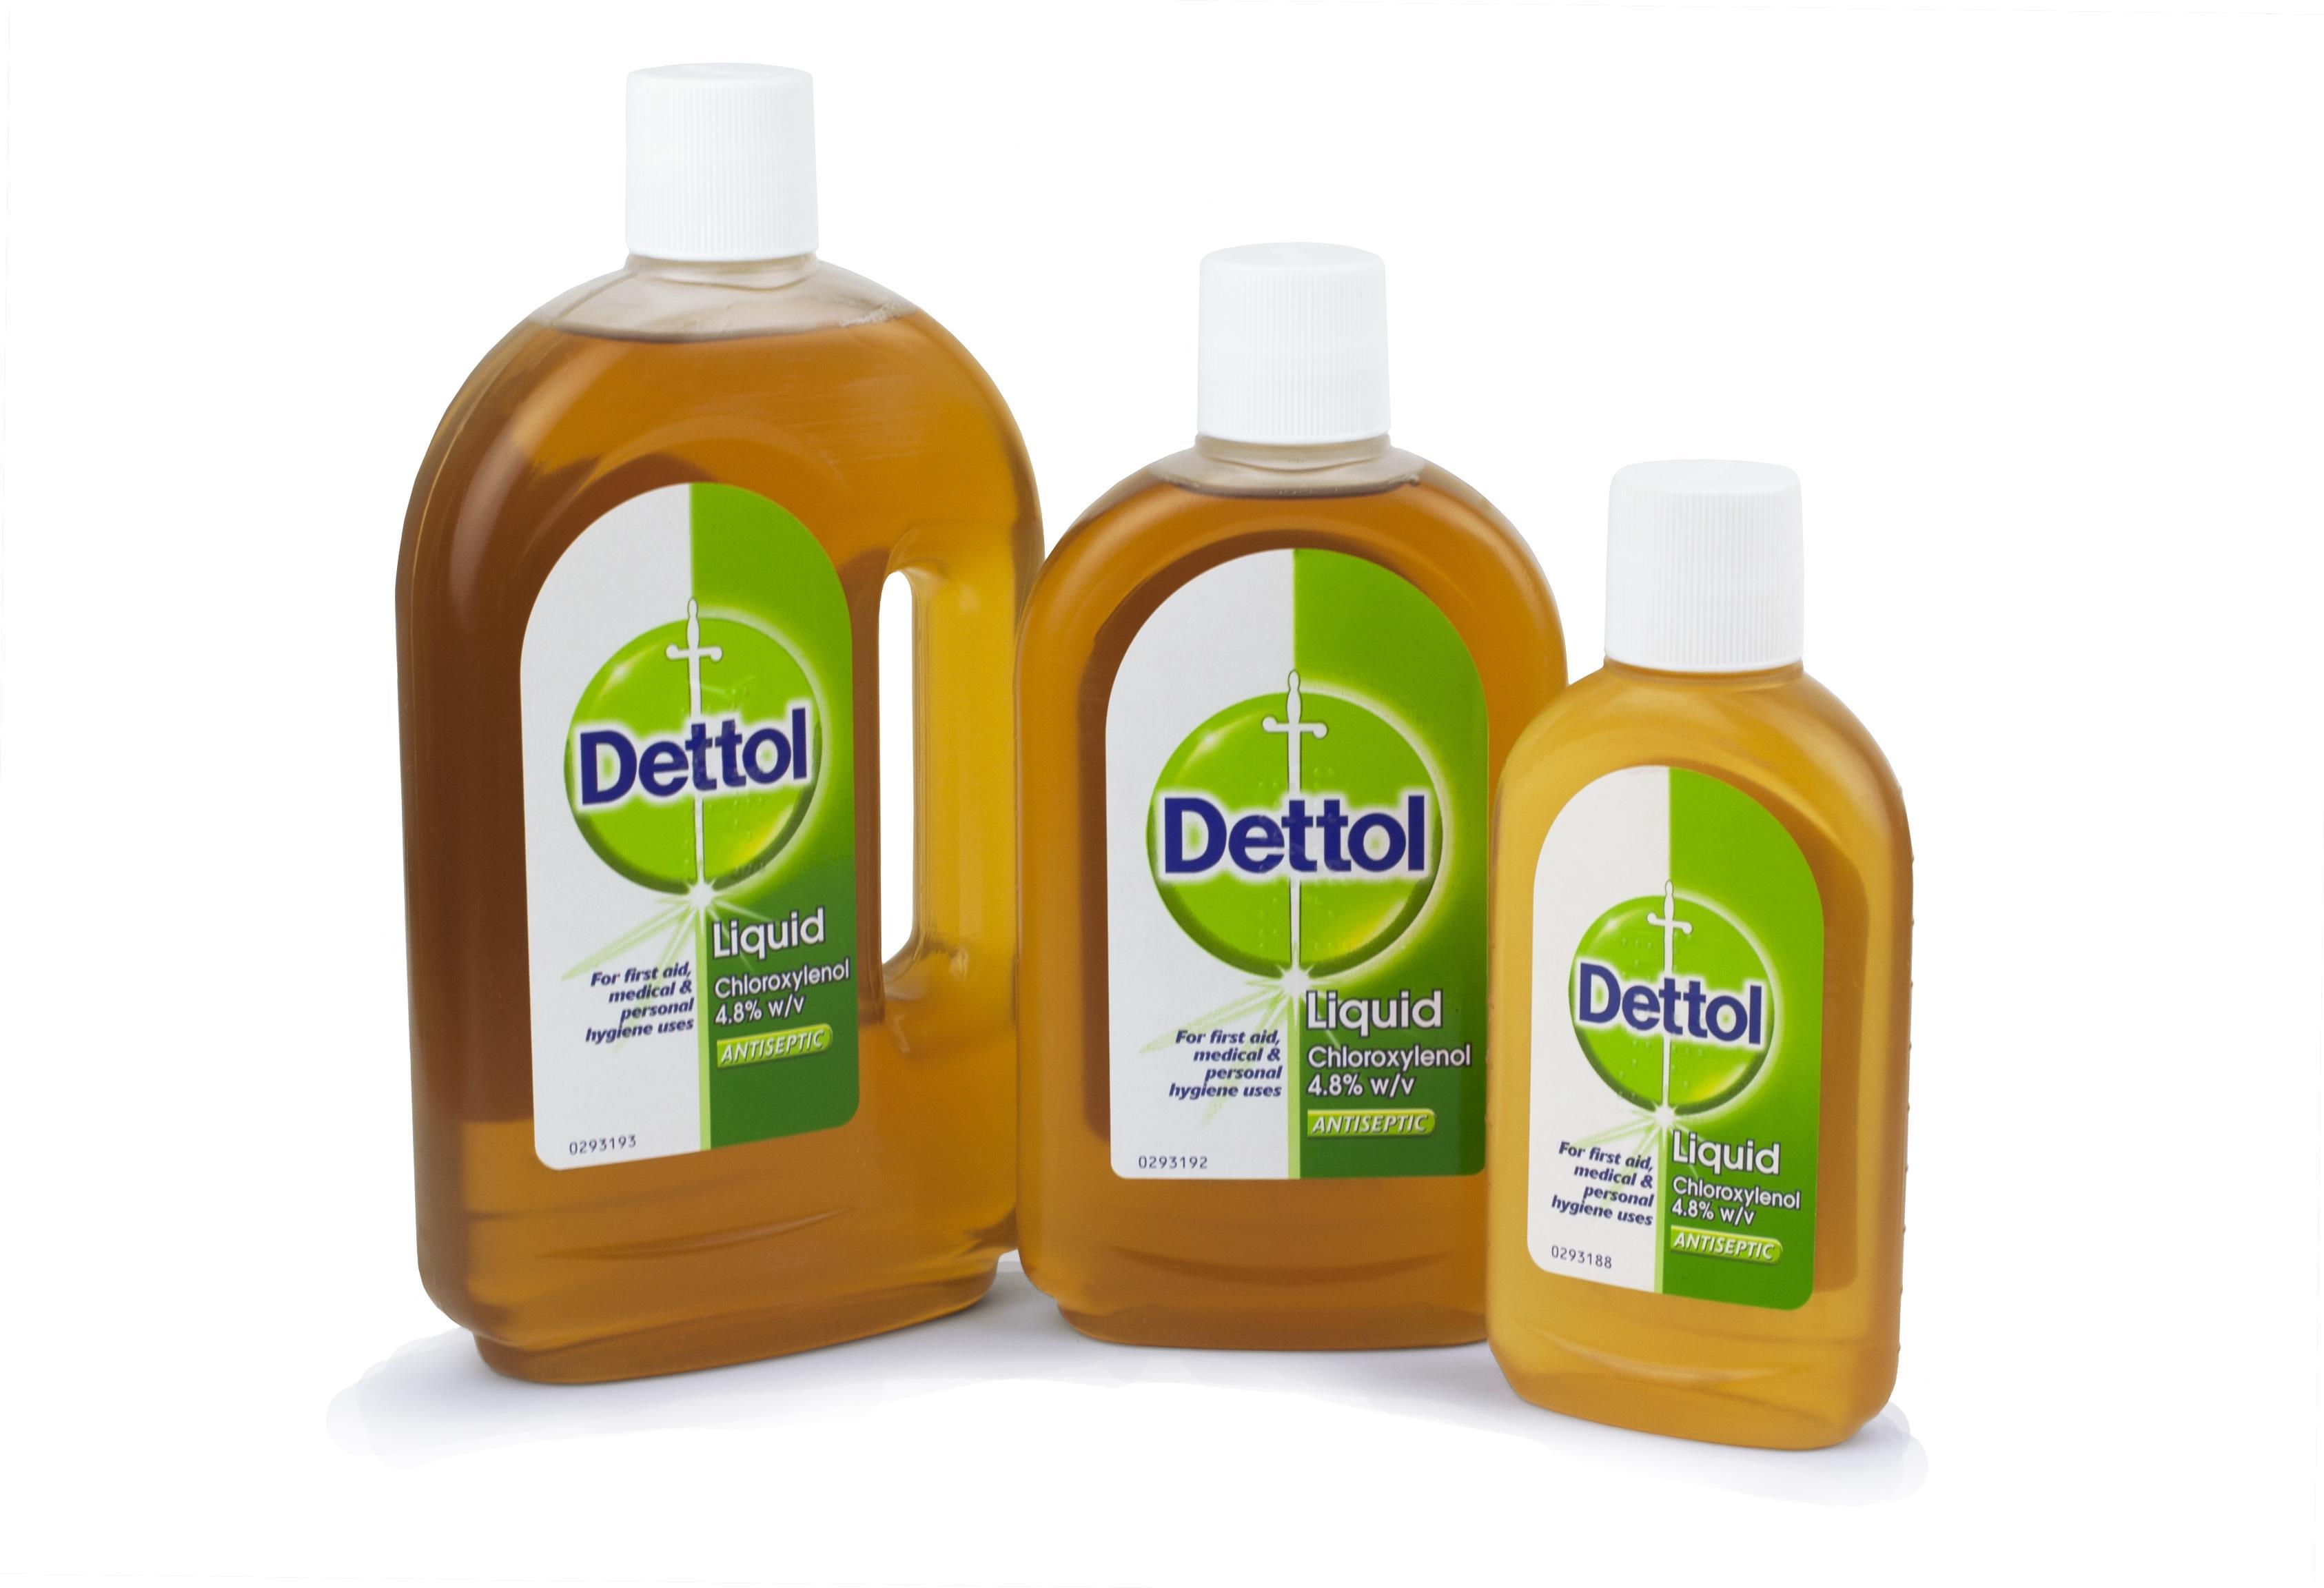 Jual Sabun Mandi Distributor Beli Supplier Eksportir Harmoni Dettol Liquid 95 Ml Anti Bakteri Antiseptik Cair 4 X 12